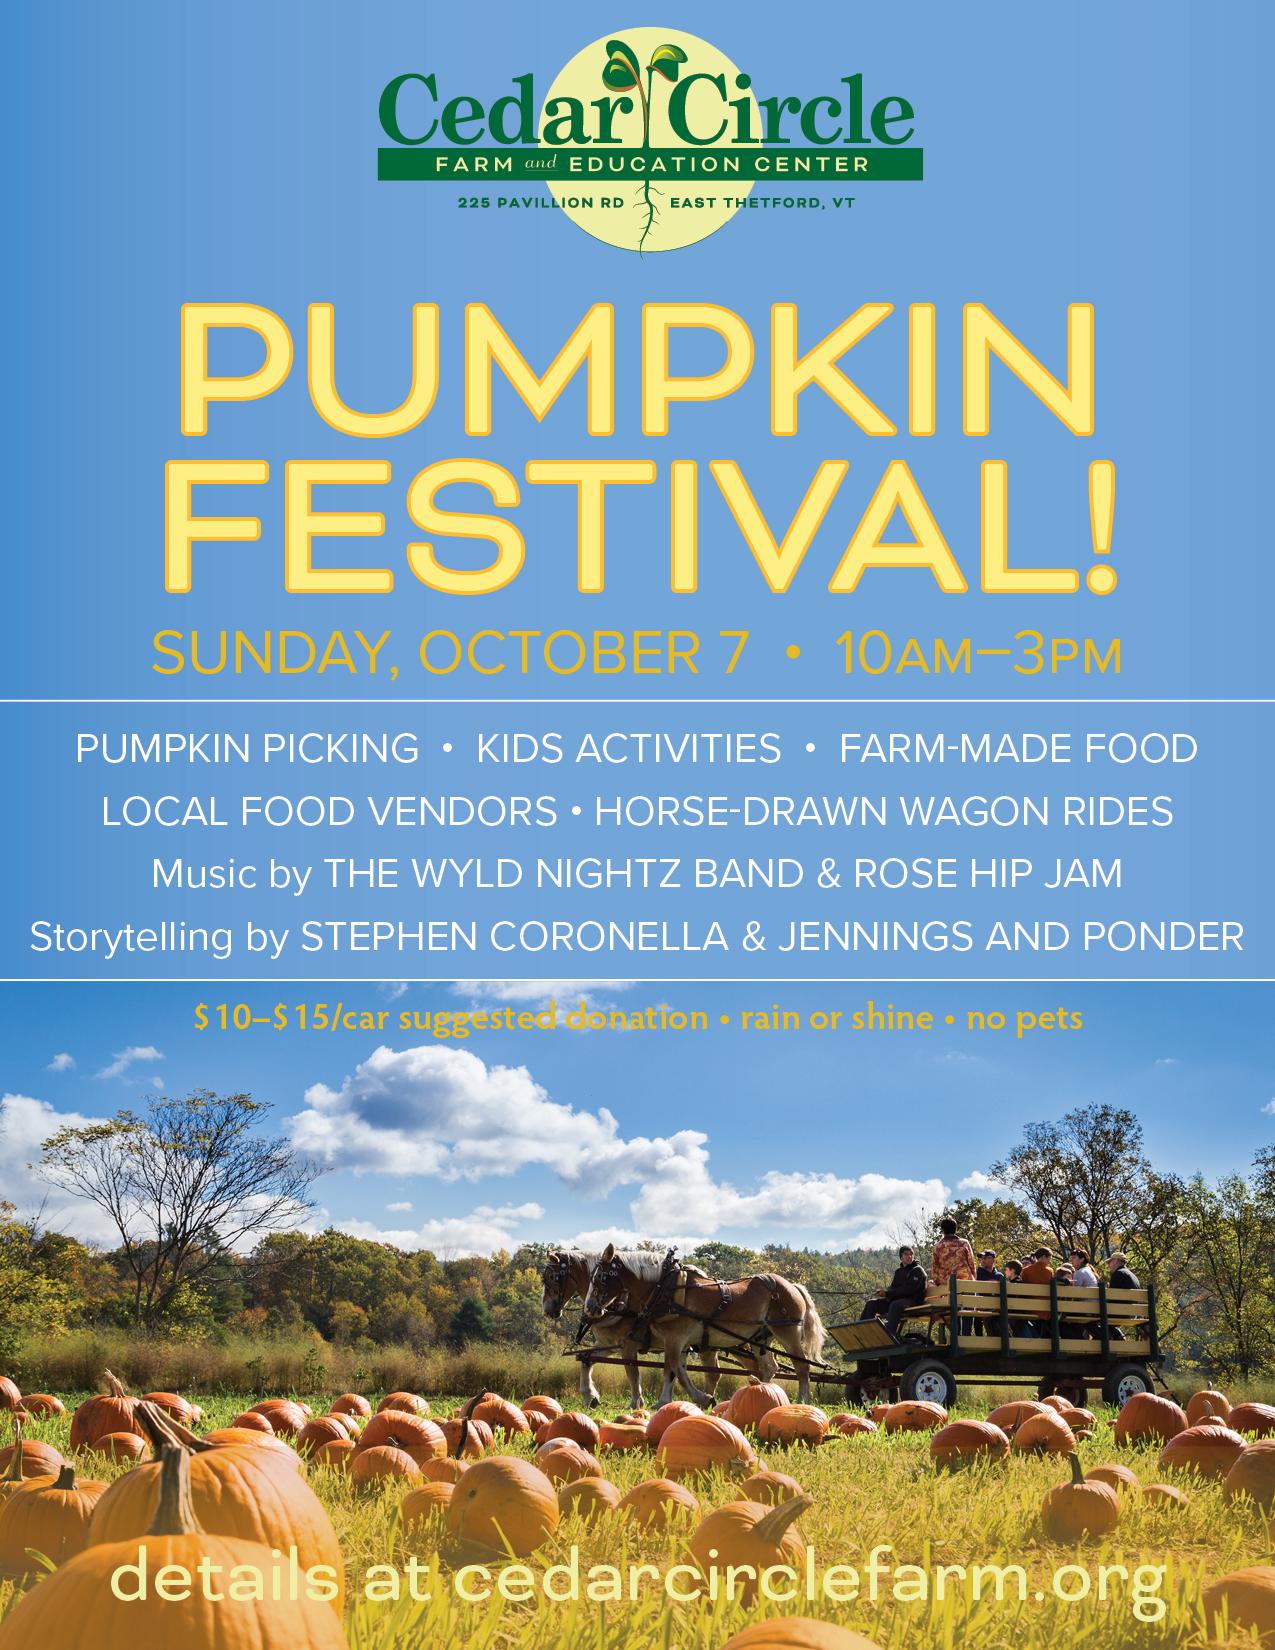 Pumpkin Festival Poster 2018.png